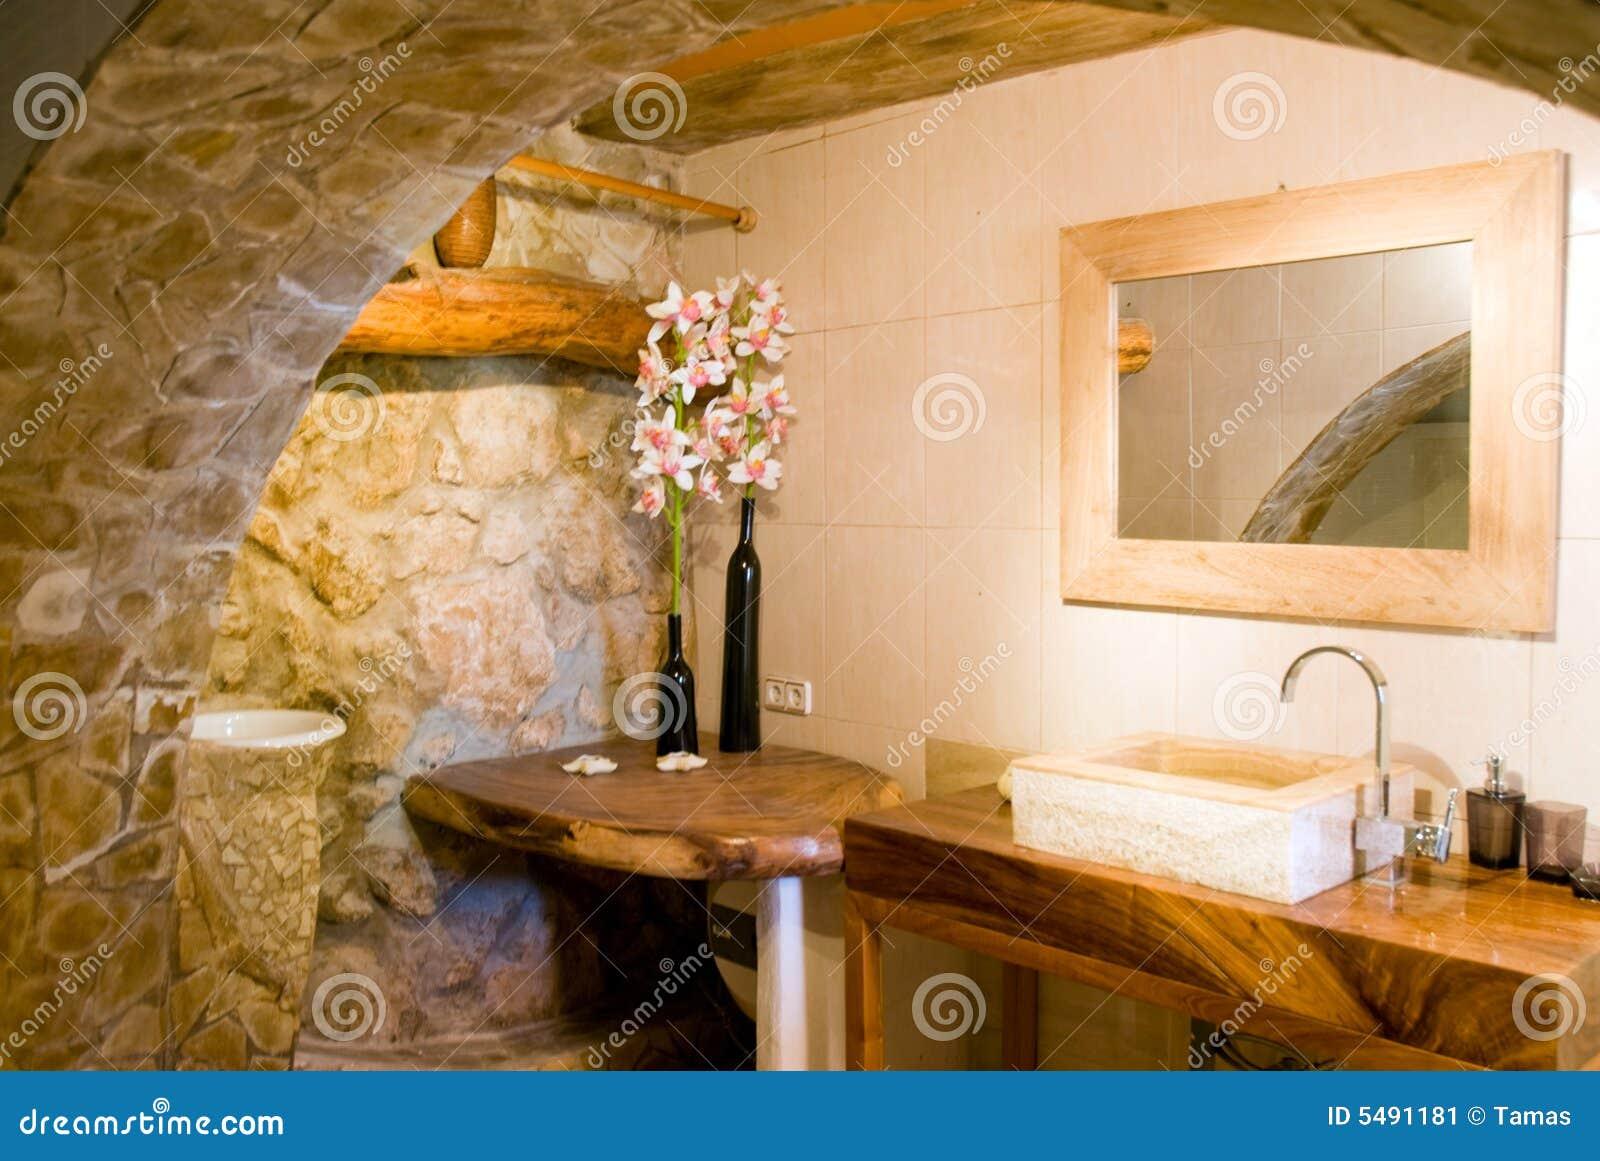 Rustieke badkamers in goud stock afbeelding afbeelding bestaande uit steen 5491181 - Badkamers ...